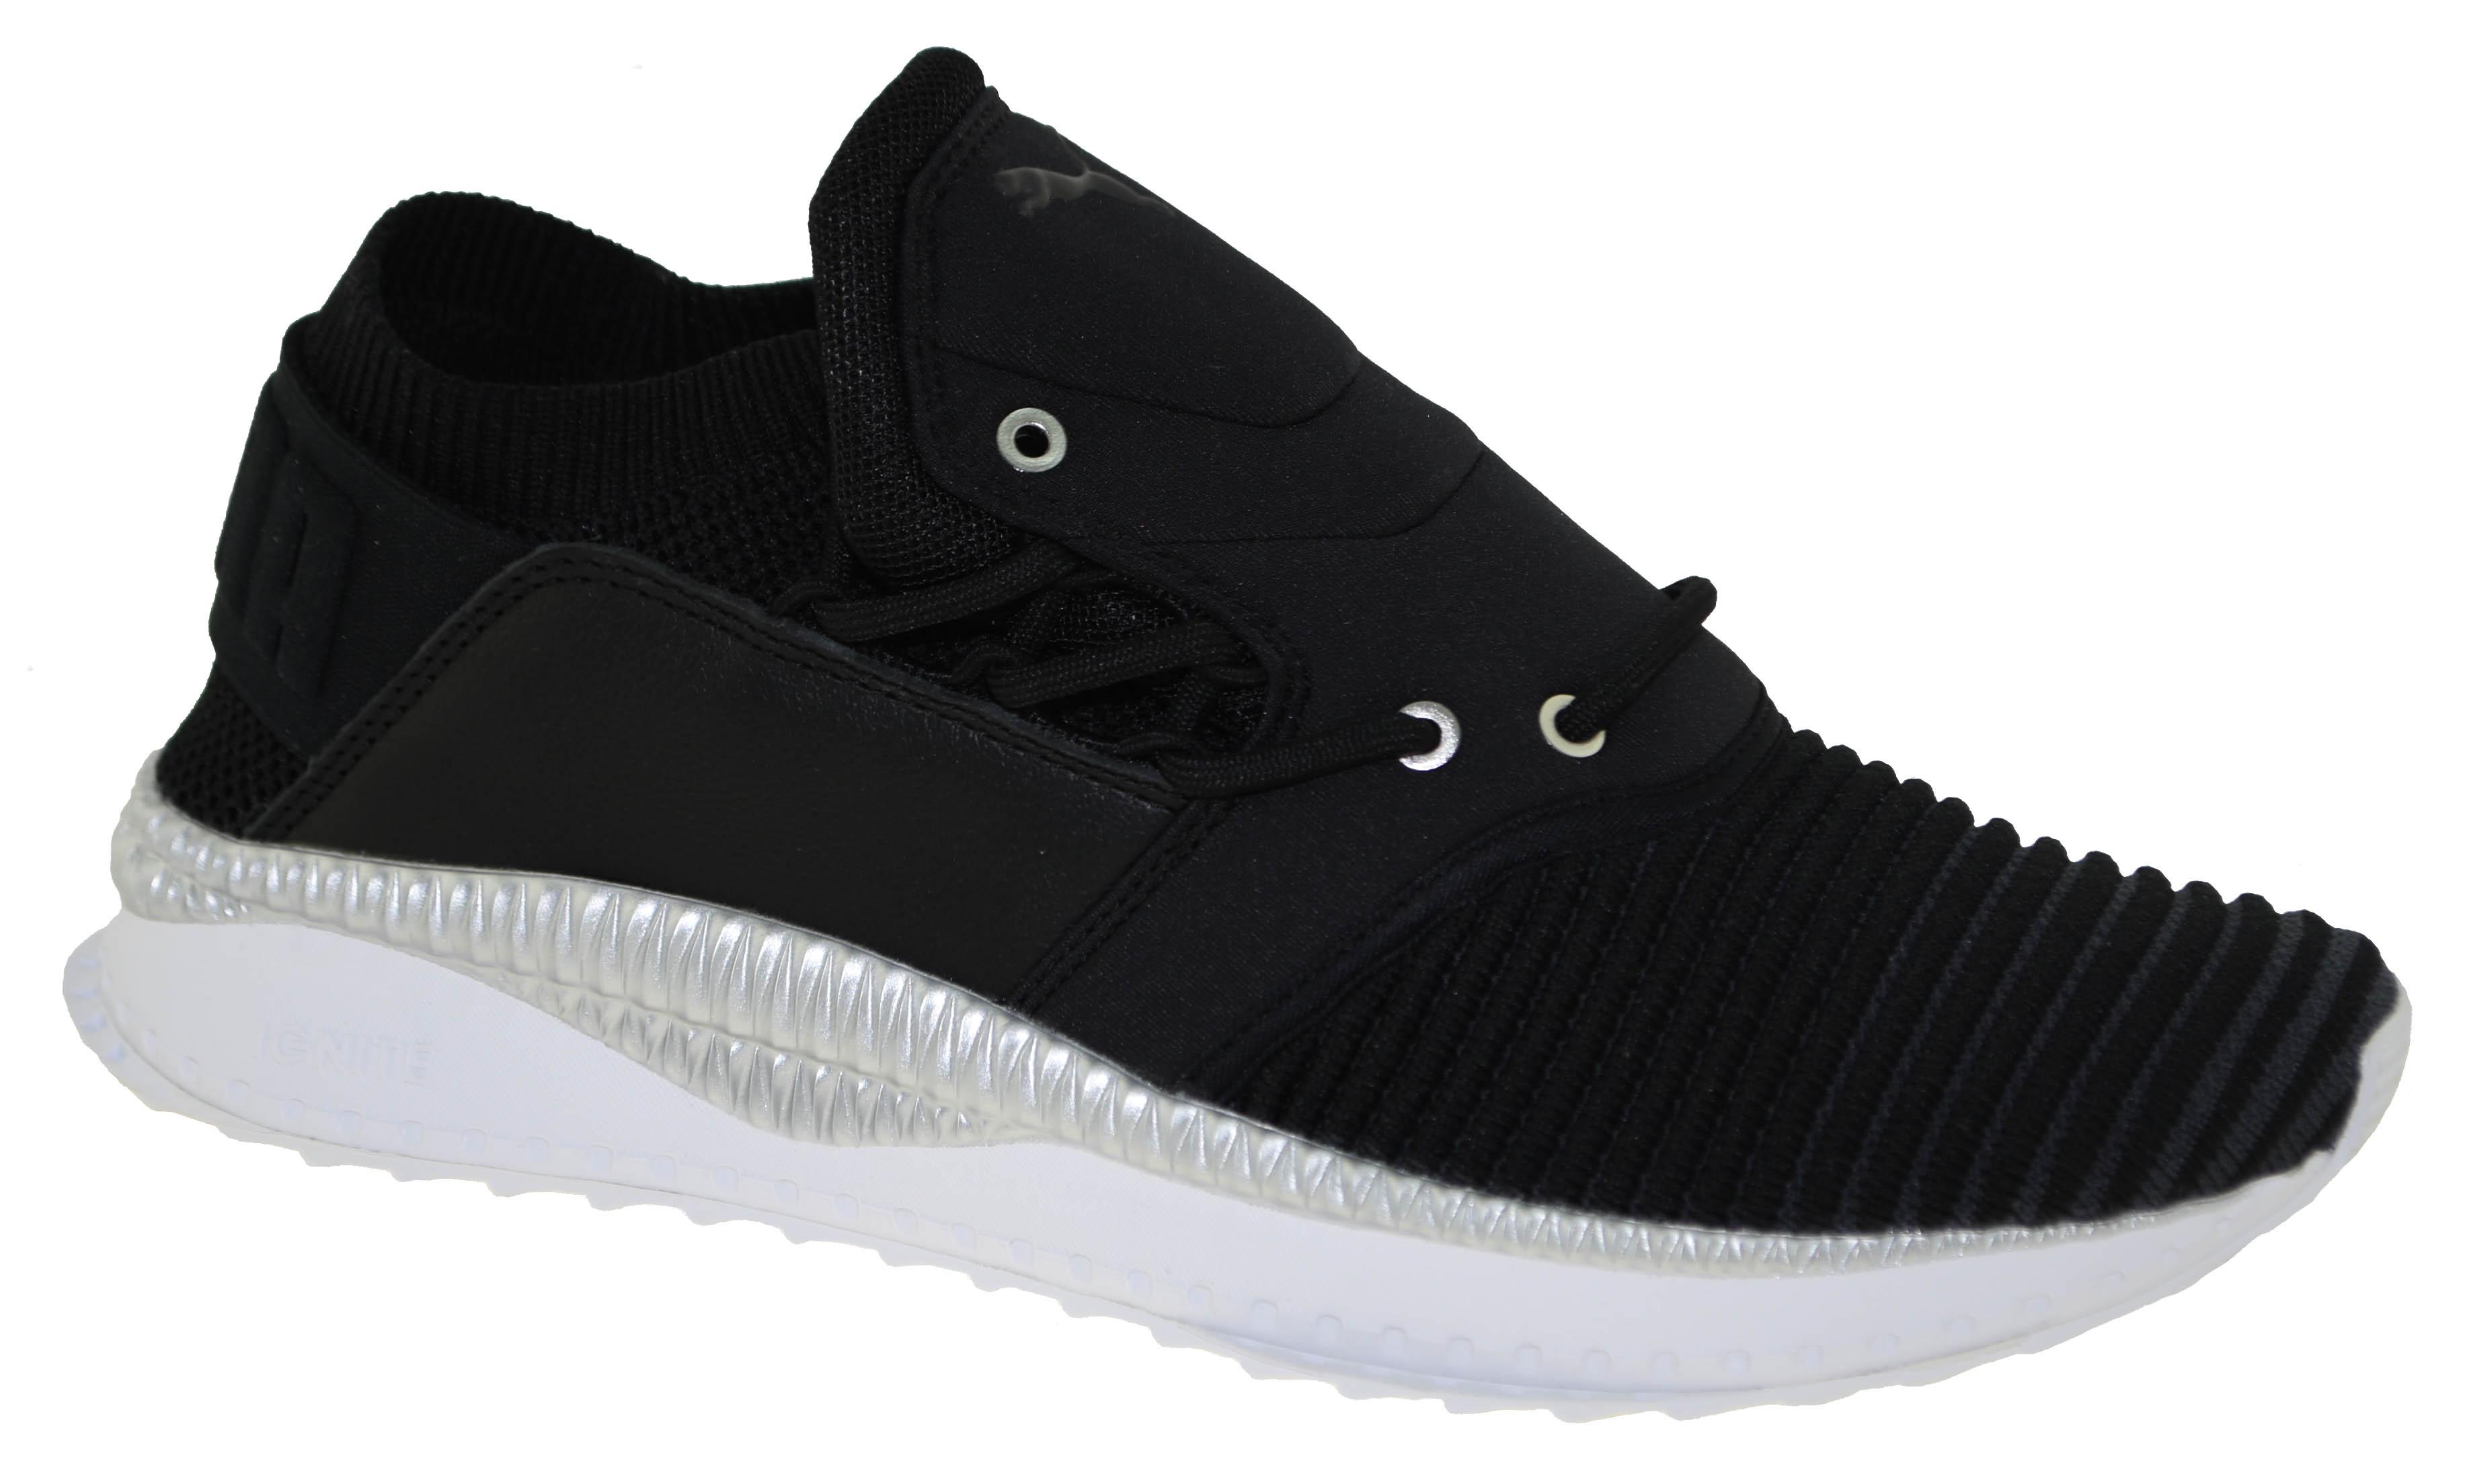 Tsugi Shinsei Running Shoes Black